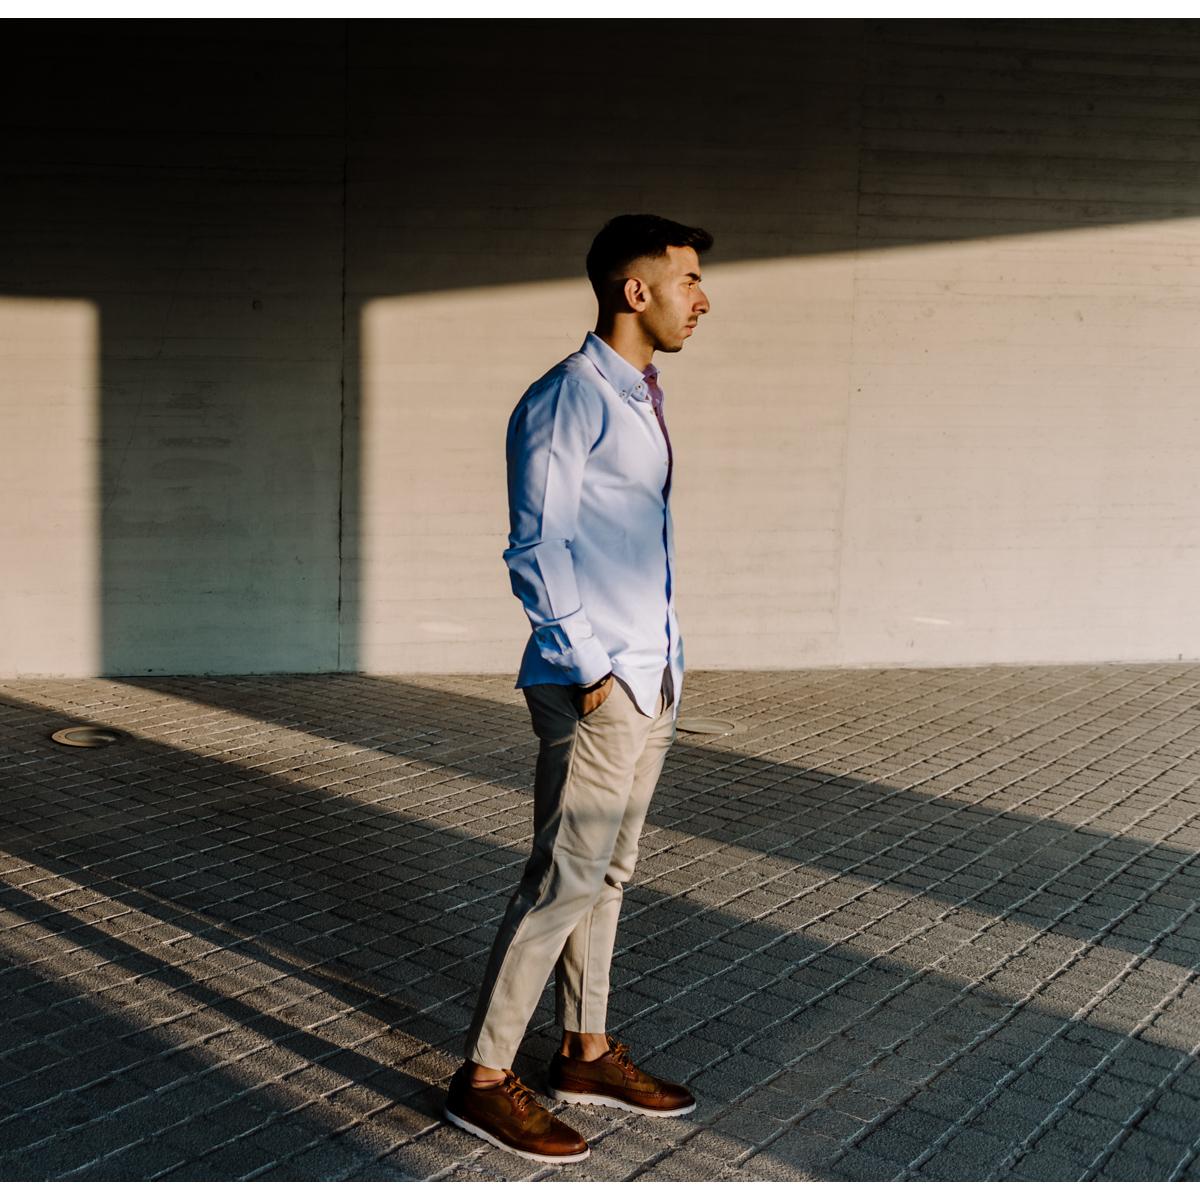 Enrique - Portfolio - Deporte-Joseangelfoto-044.jpg